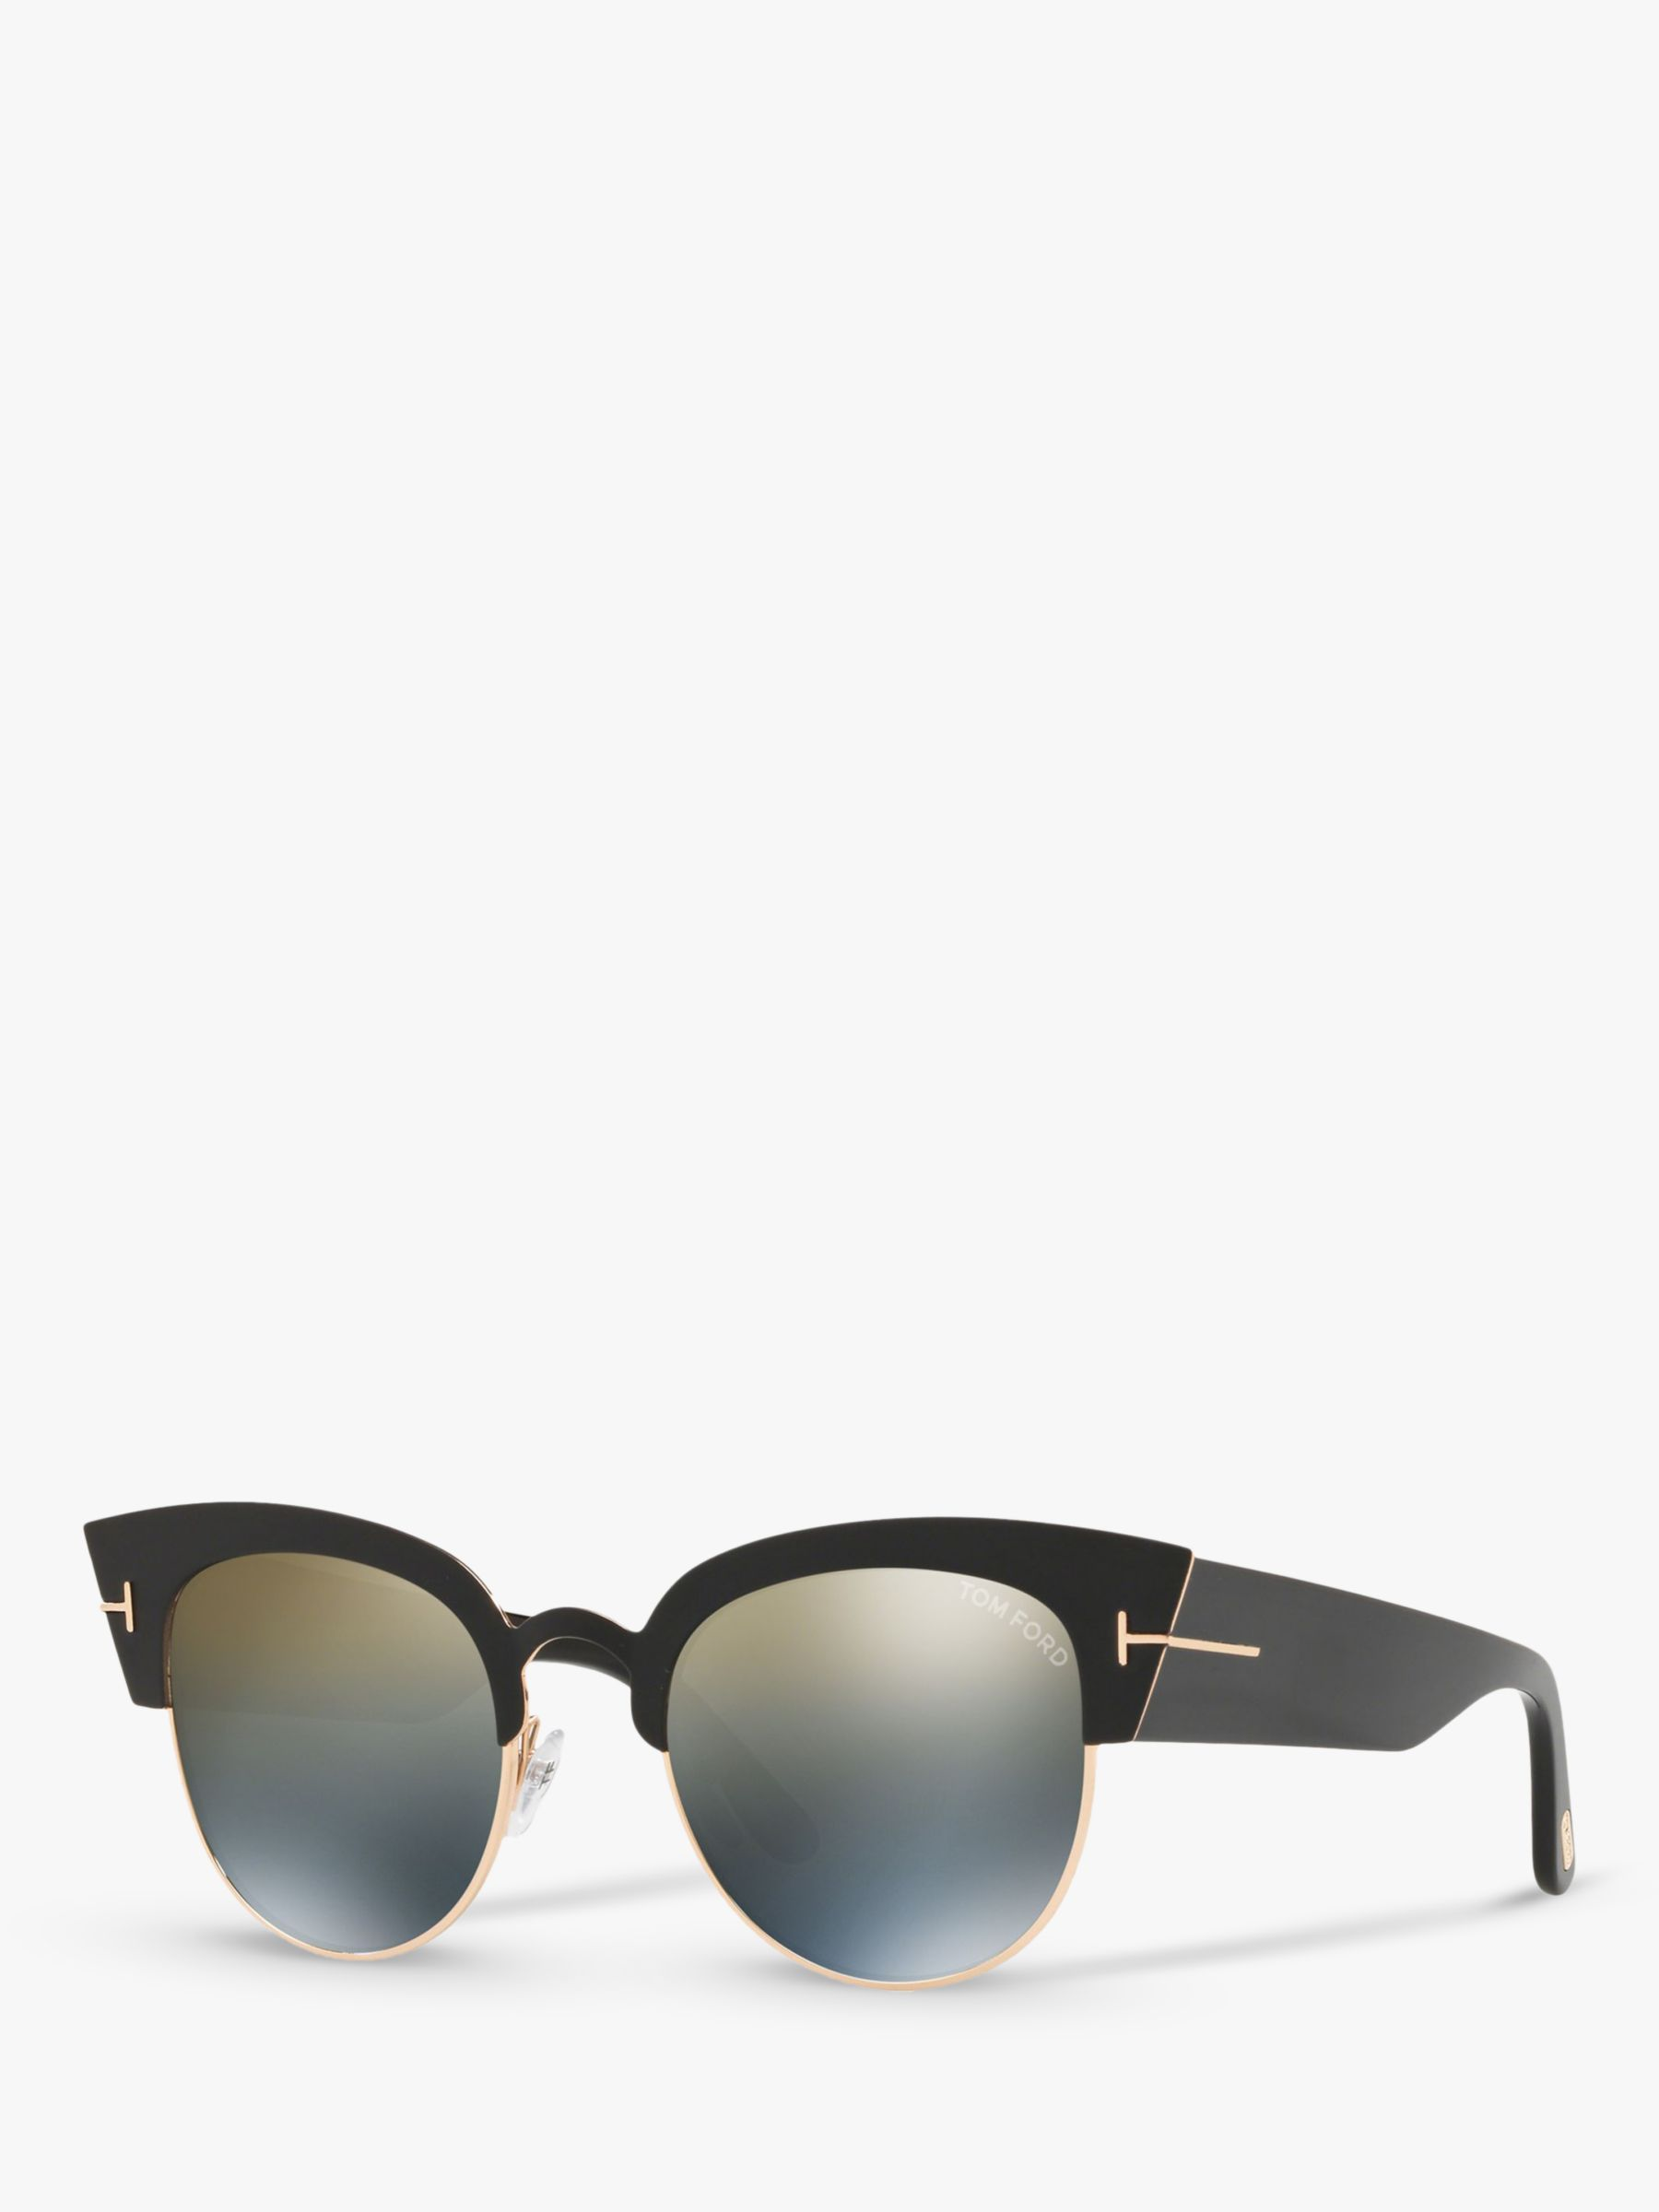 Tom Ford TOM FORD FT0607 Women's Alexandra Cat's Eye Sunglasses, Black/Mirror Grey